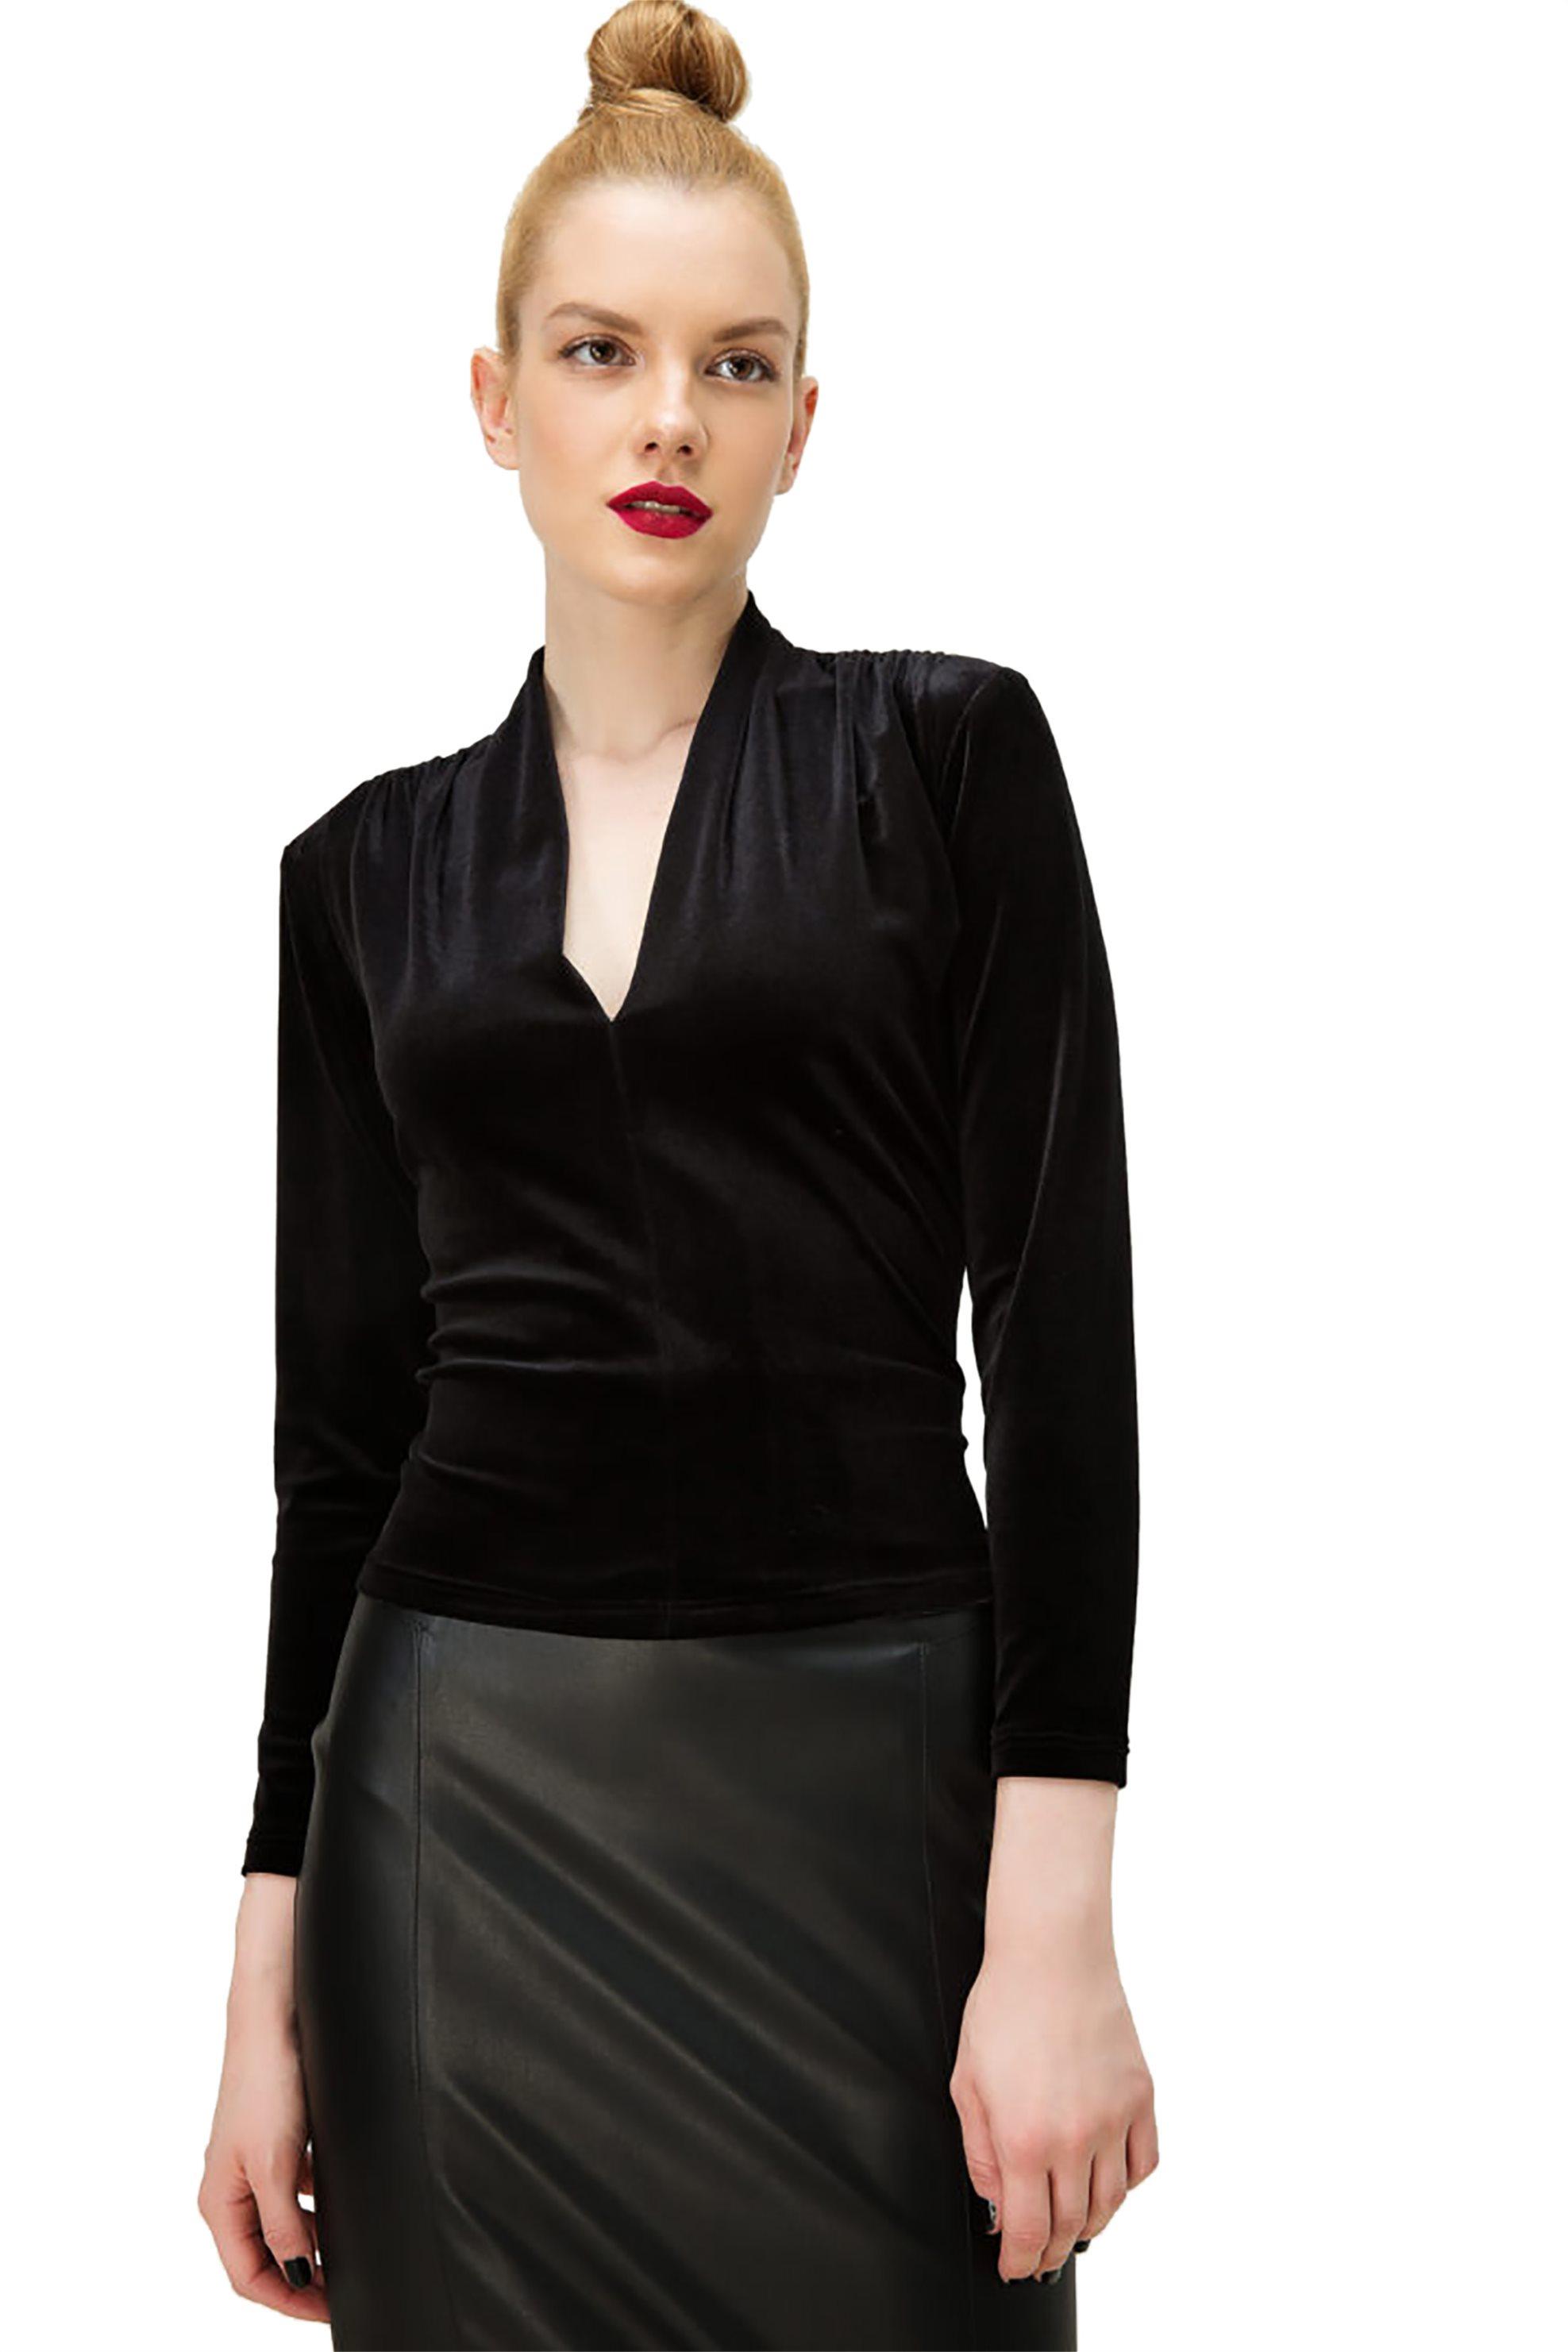 Billy Sabbado γυναικεία μπλούζα με δαντέλα στην πλάτη - 0103261961 - Μαύρο γυναικα   ρουχα   tops   μπλούζες   βραδυνές